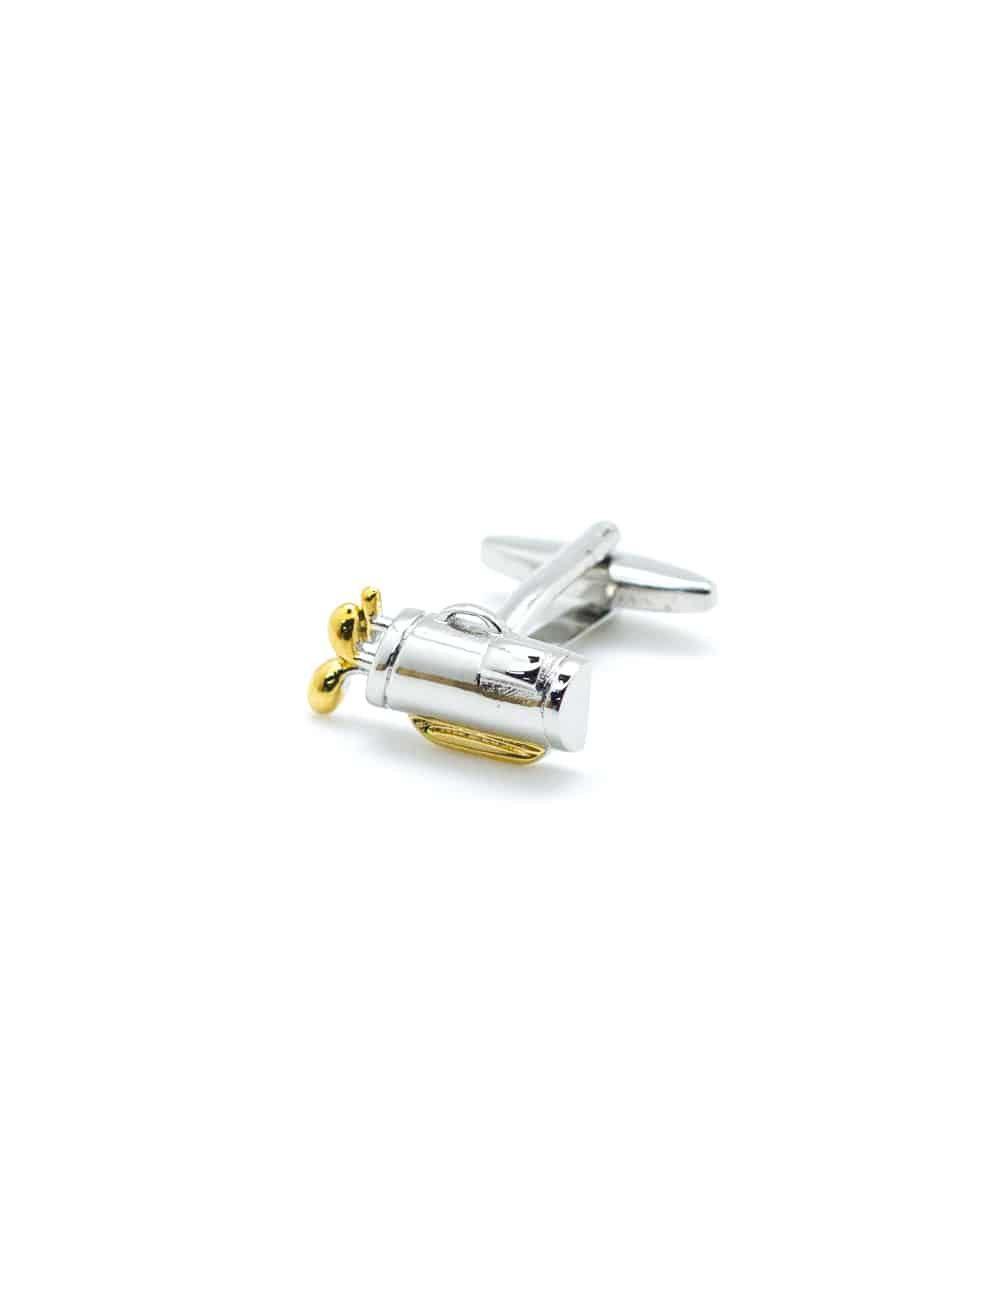 Chrome silver & gold golf set in a bag cufflink 0111-014B